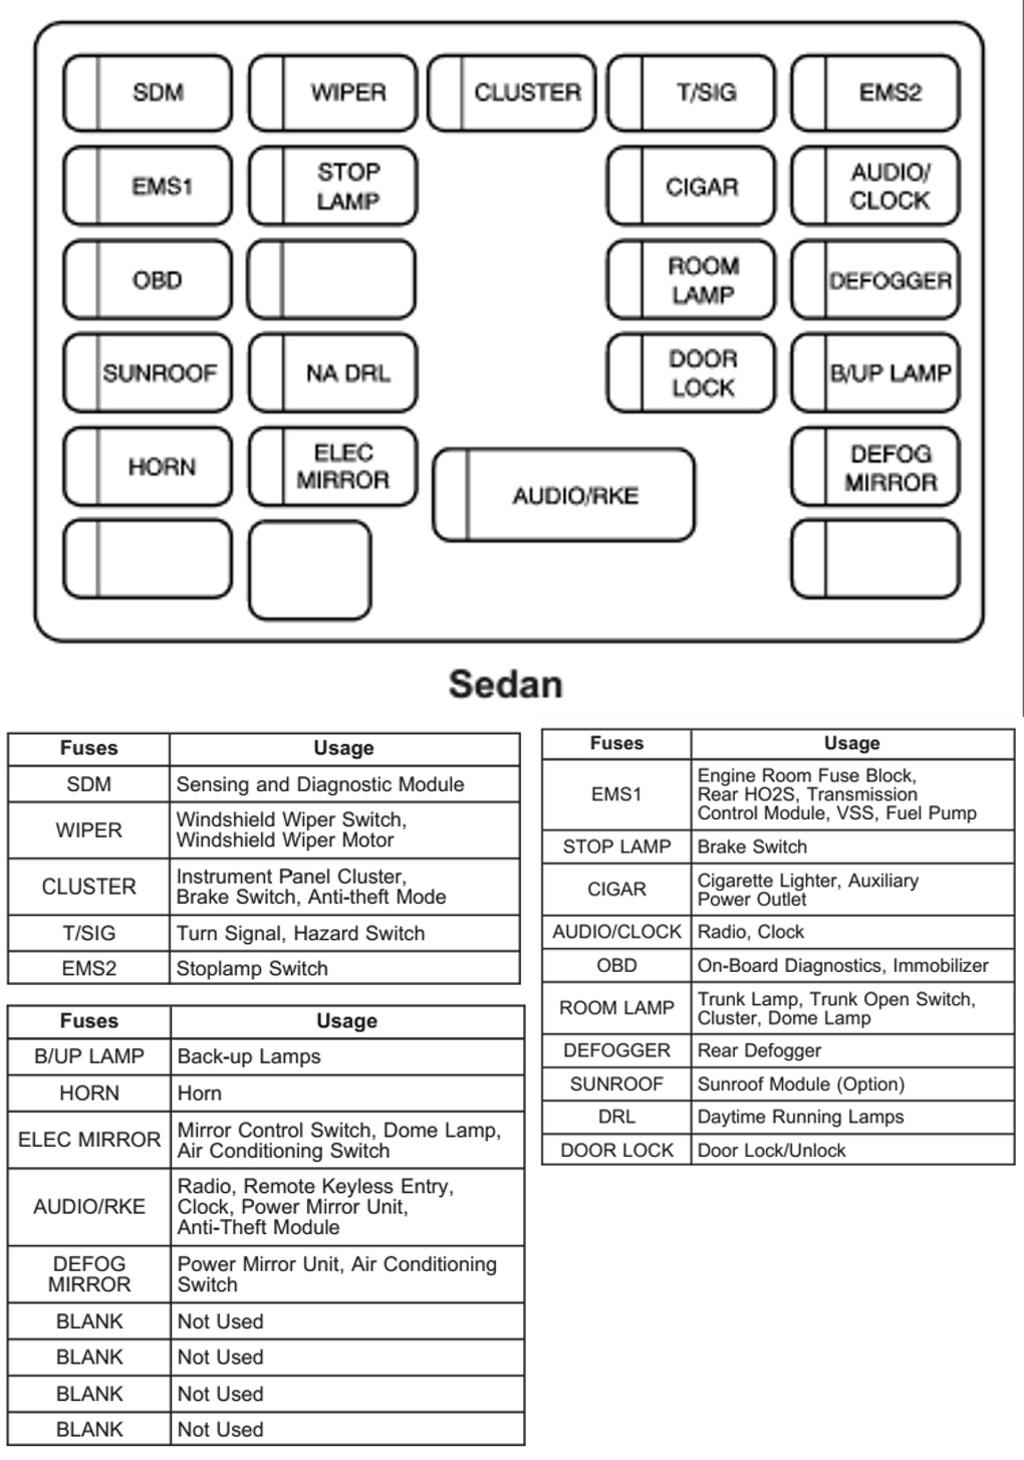 [SCHEMATICS_4LK]  EA_8327] 2007 Pontiac G6 Rear Fuse Box Download Diagram   2007 Pontiac G6 Fuse Box Schematic      Phot Oliti Pap Mohammedshrine Librar Wiring 101